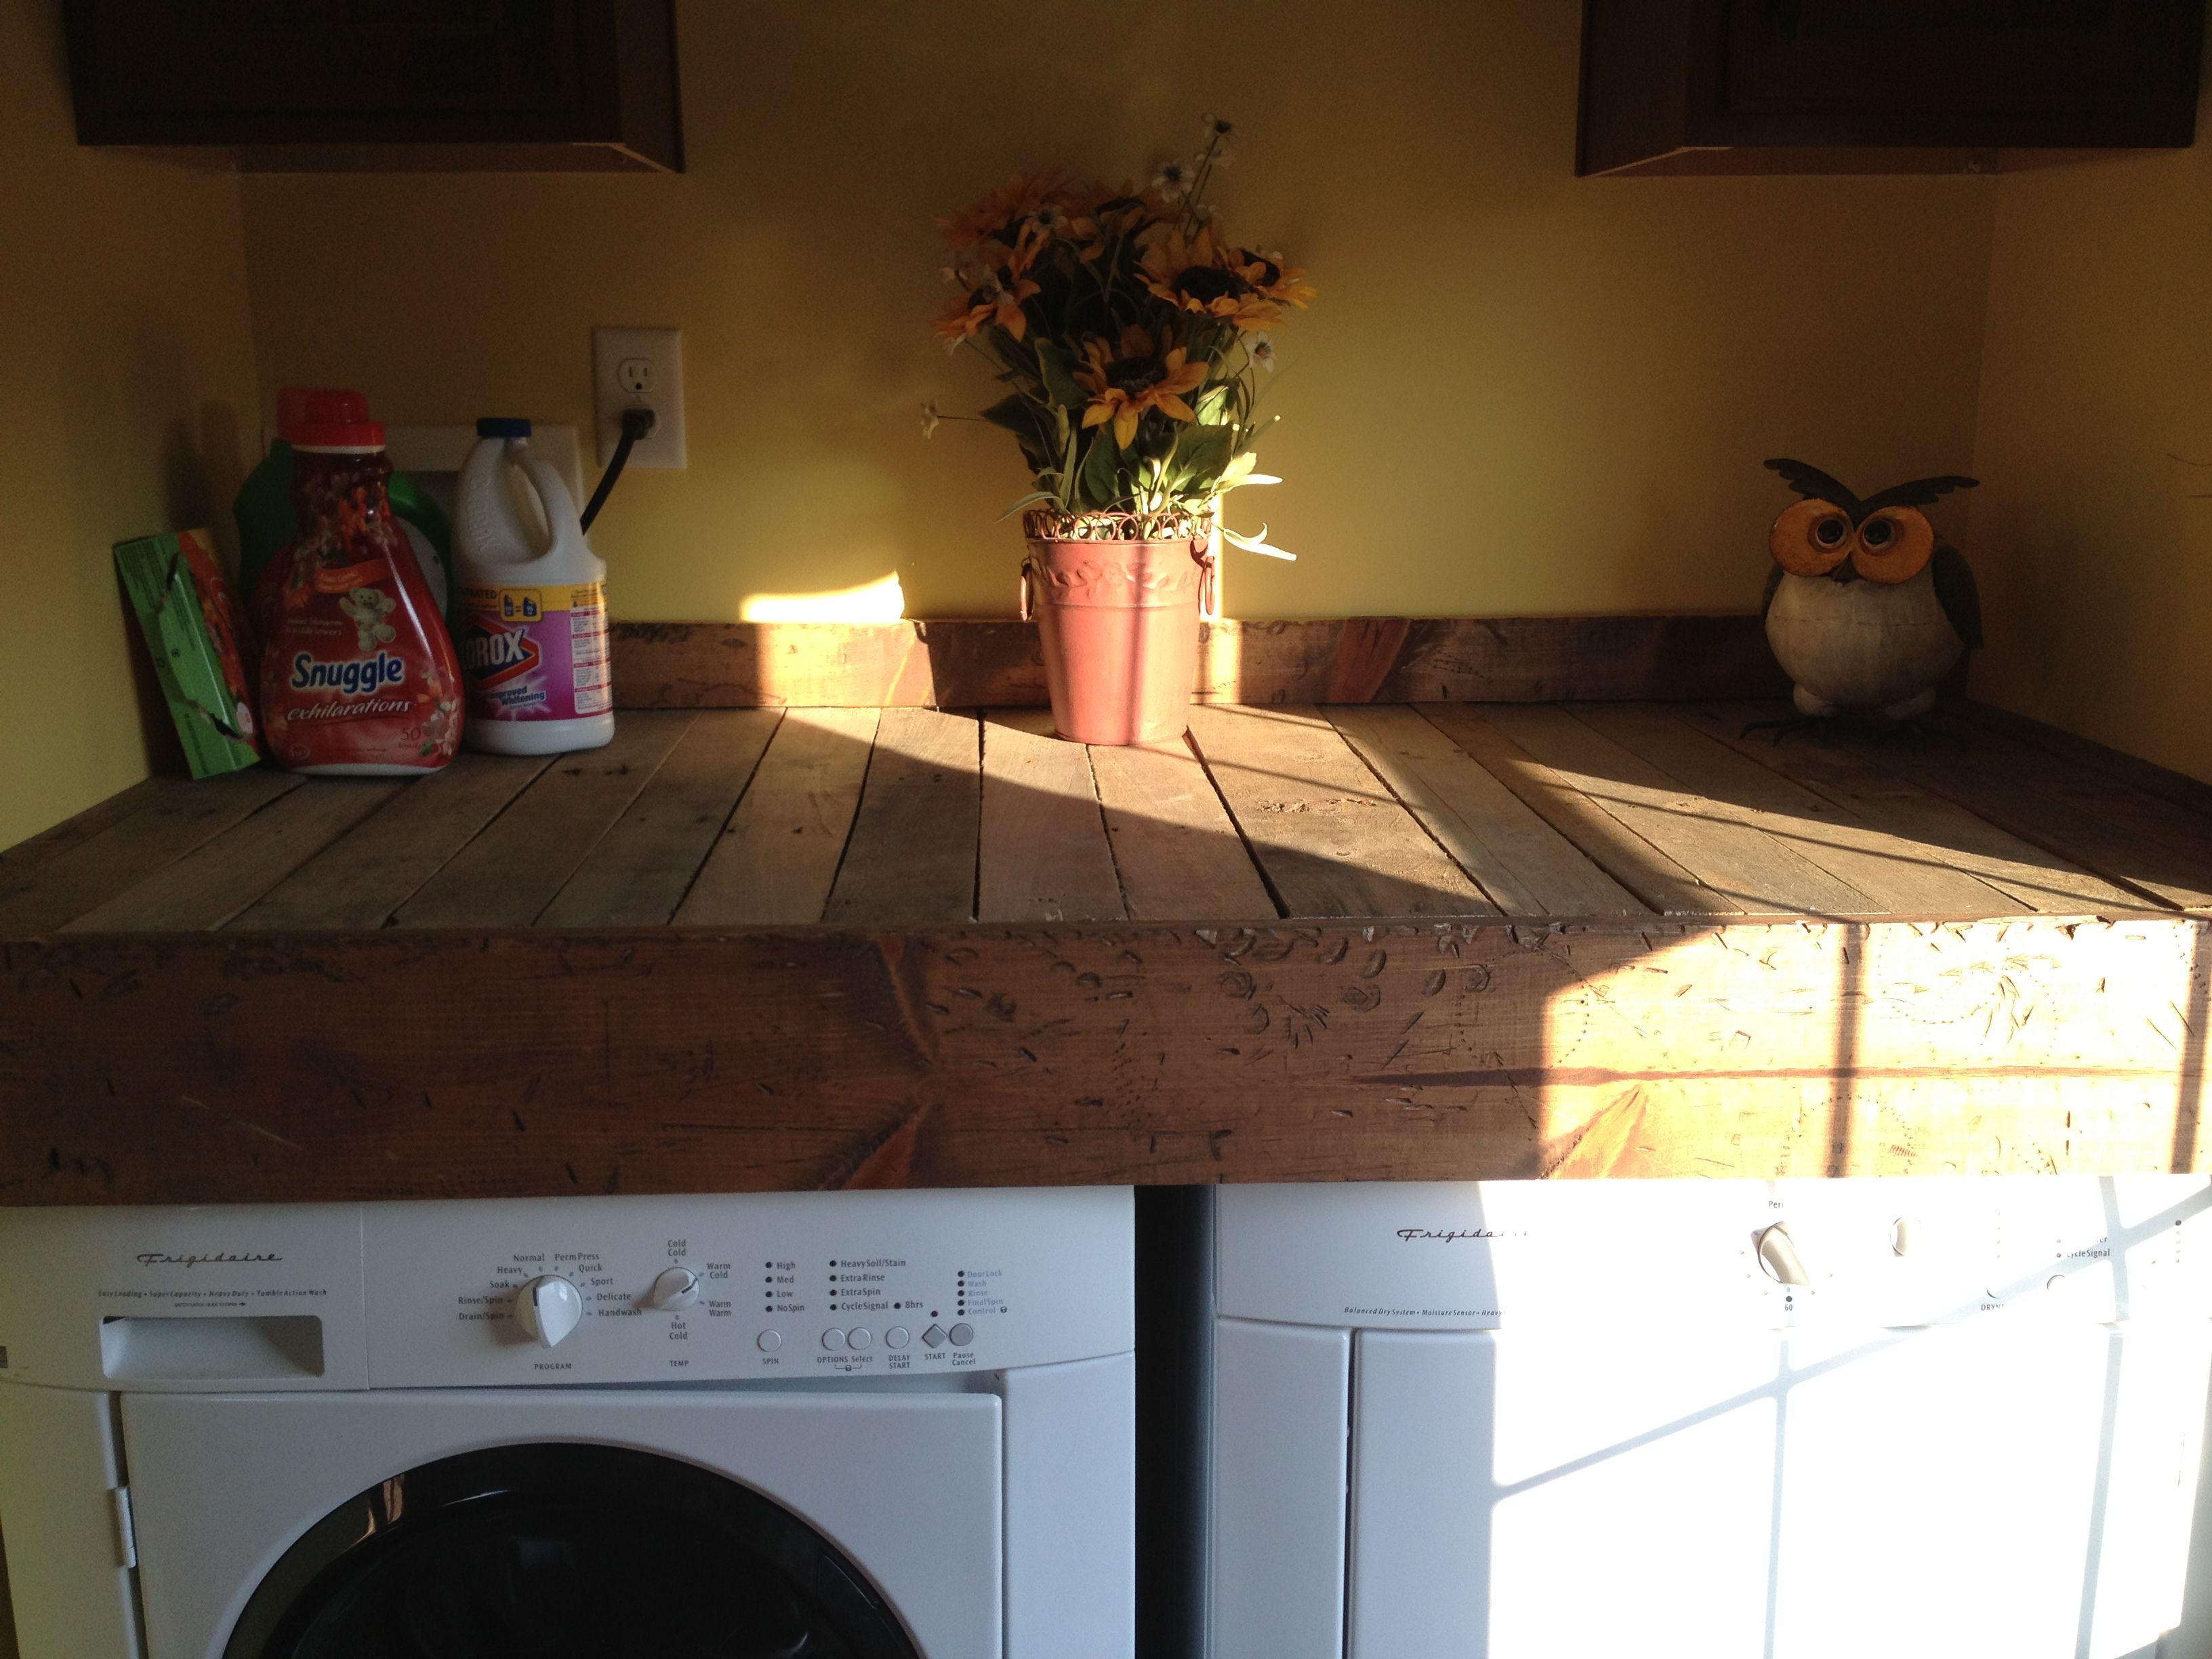 popular items laundry room decor. Pallet Shelf For Laundry Room. Decorating Popular Items Room Decor I